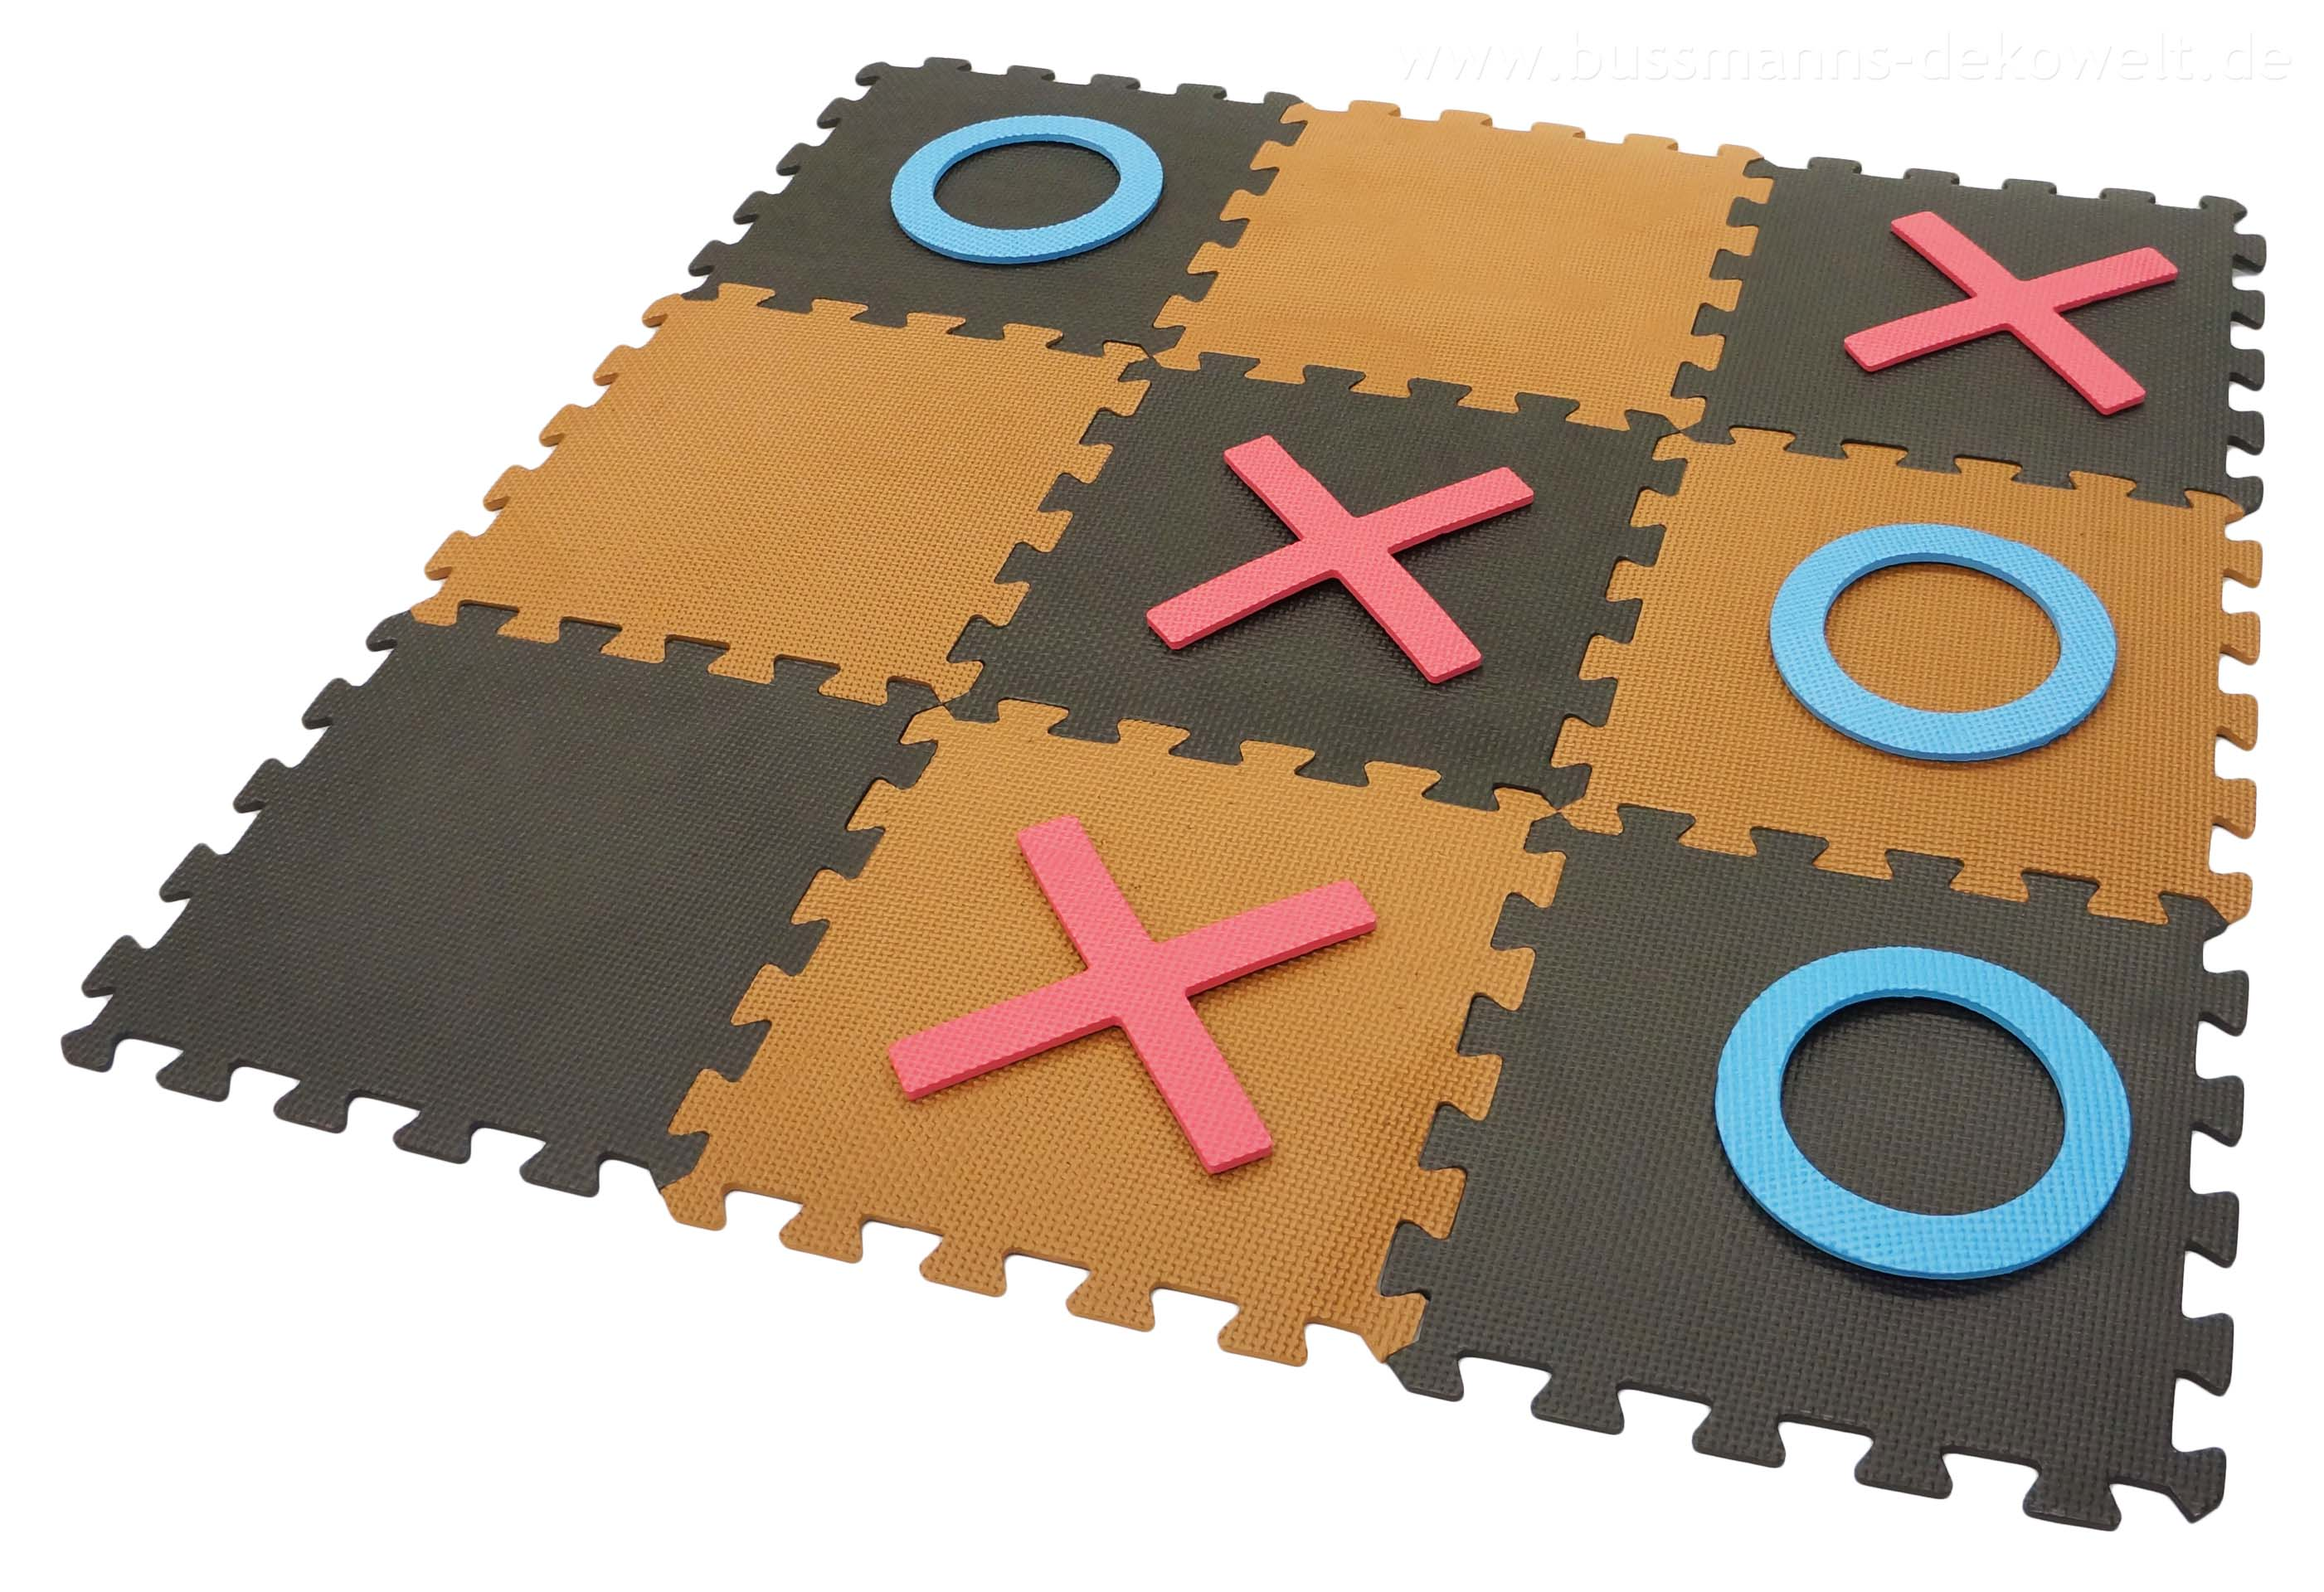 tic tac toe spiel 31x31 cm strategiespiel kinder spiele ebay. Black Bedroom Furniture Sets. Home Design Ideas